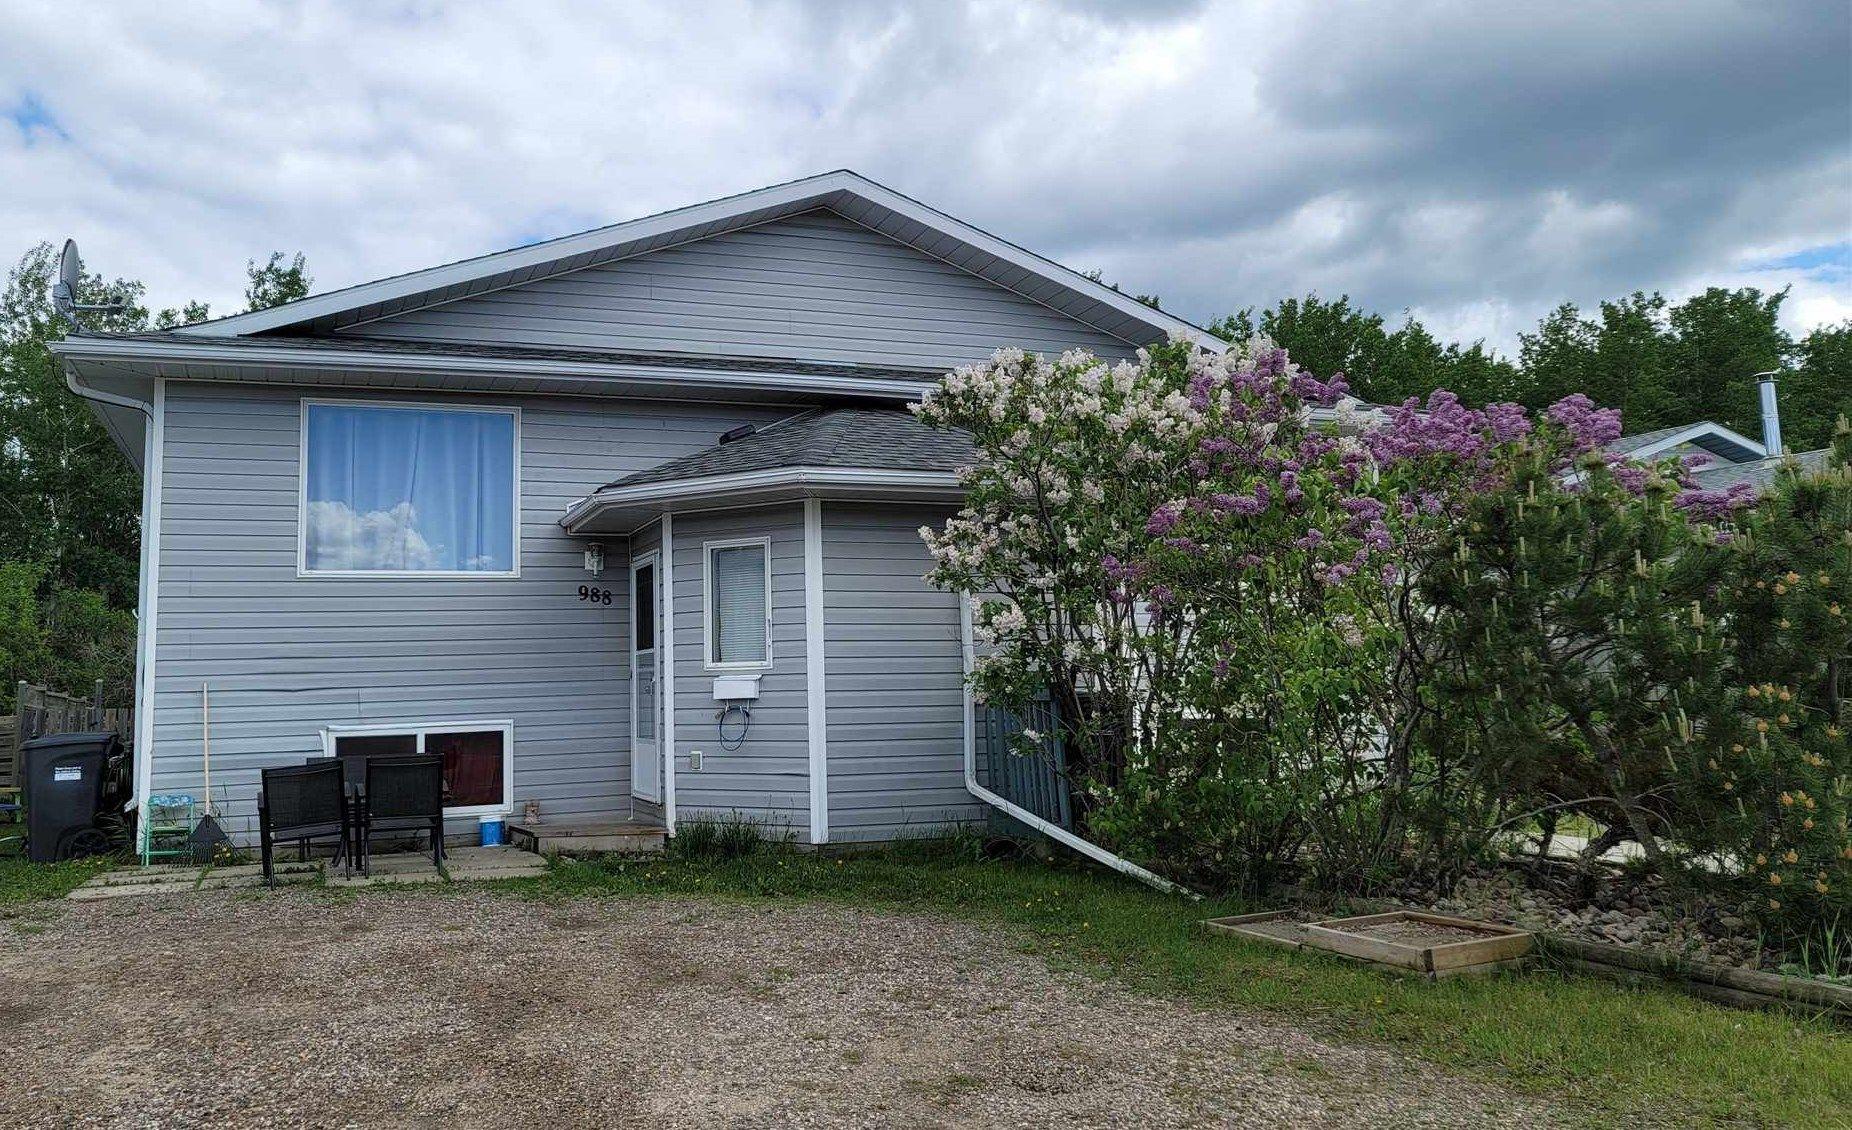 Main Photo: 988 13 Street: Cold Lake House Half Duplex for sale : MLS®# E4249327